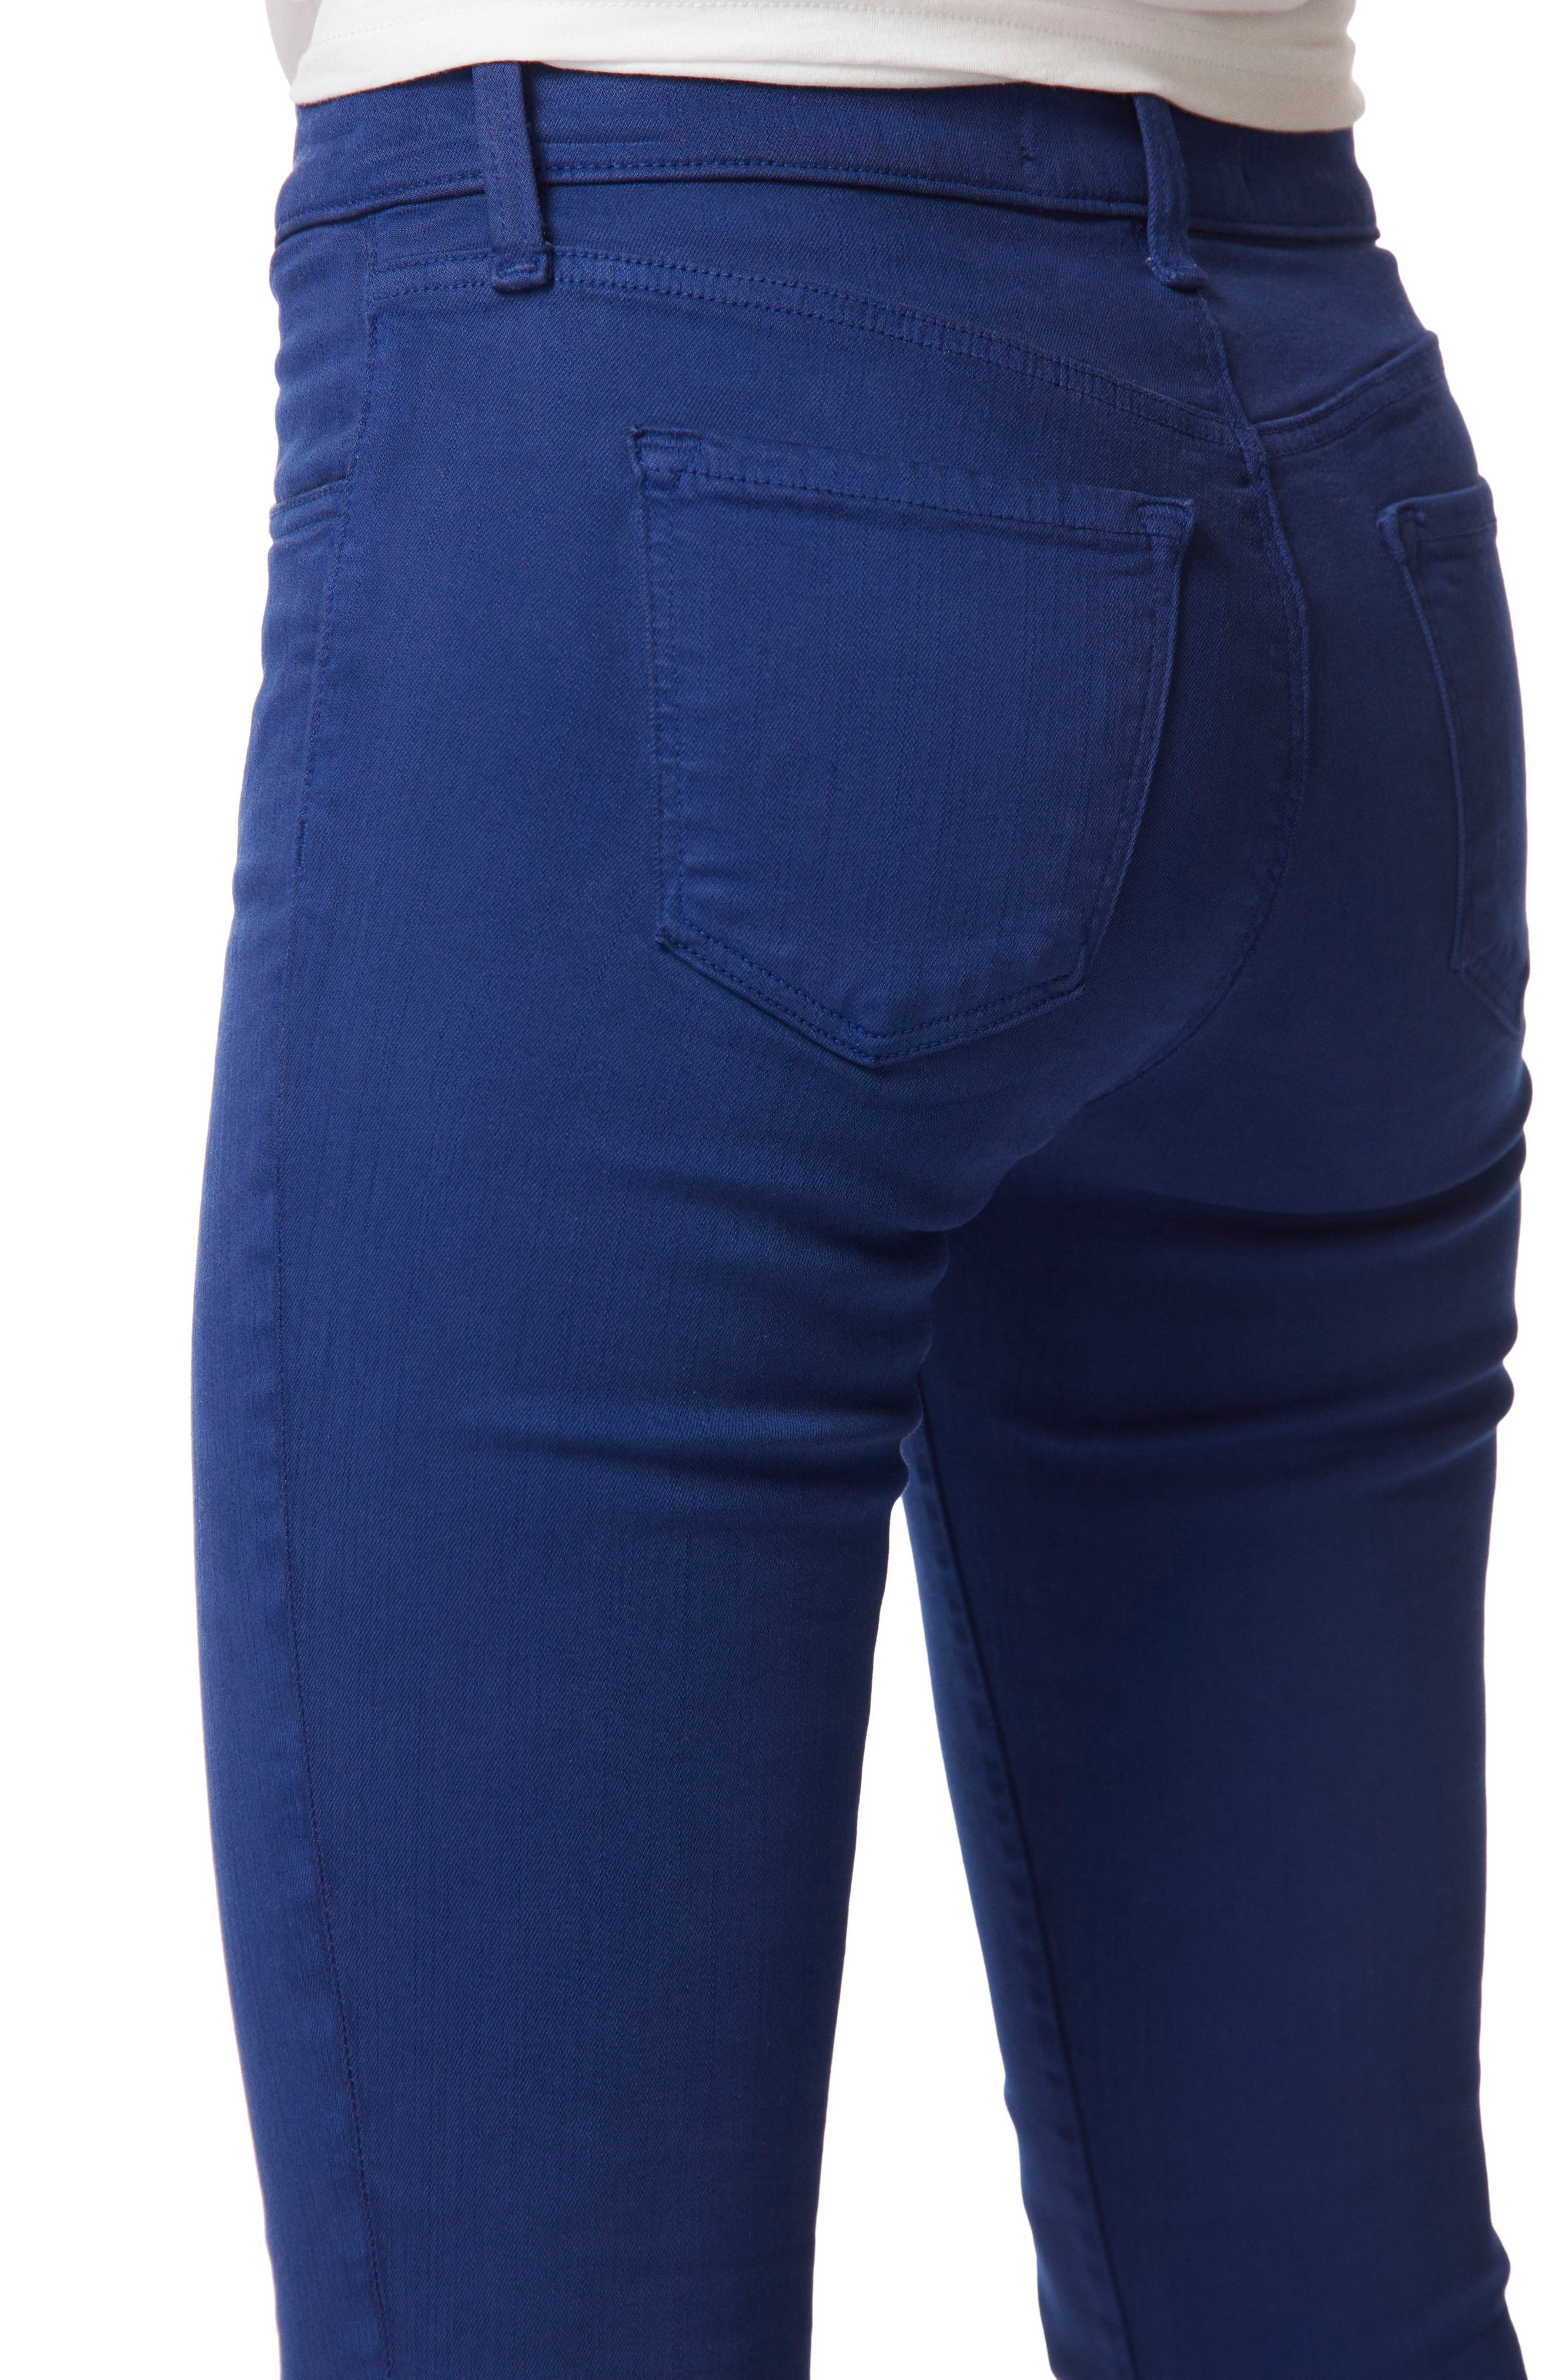 620 Mid Rise Super Skinny Jeans,                             Alternate thumbnail 4, color,                             436